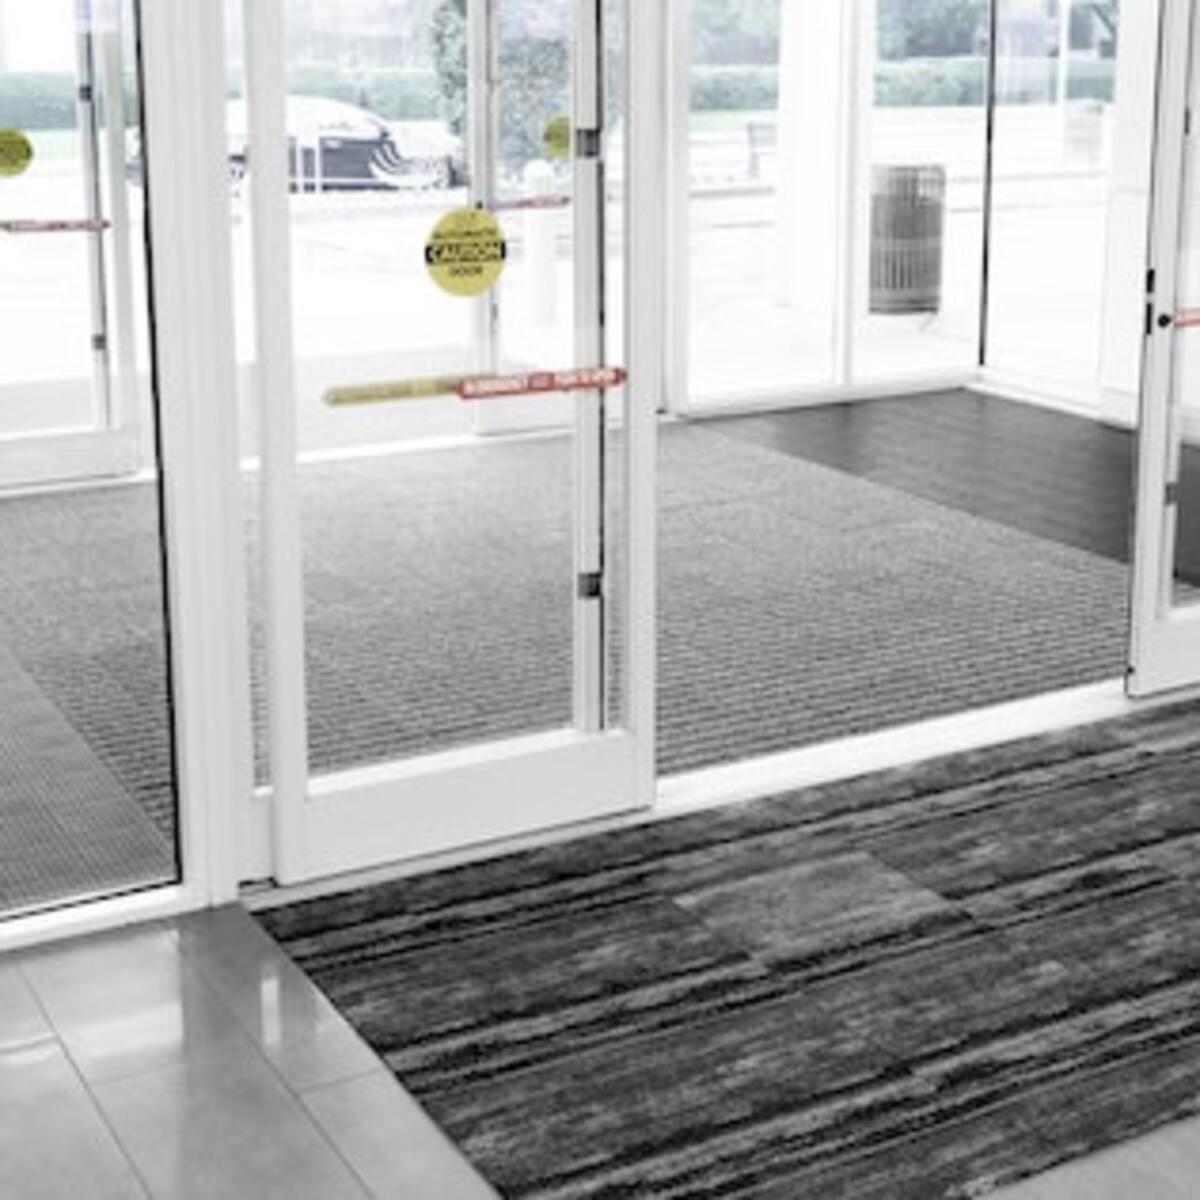 Hodge Floors: Airlock Install at GSP